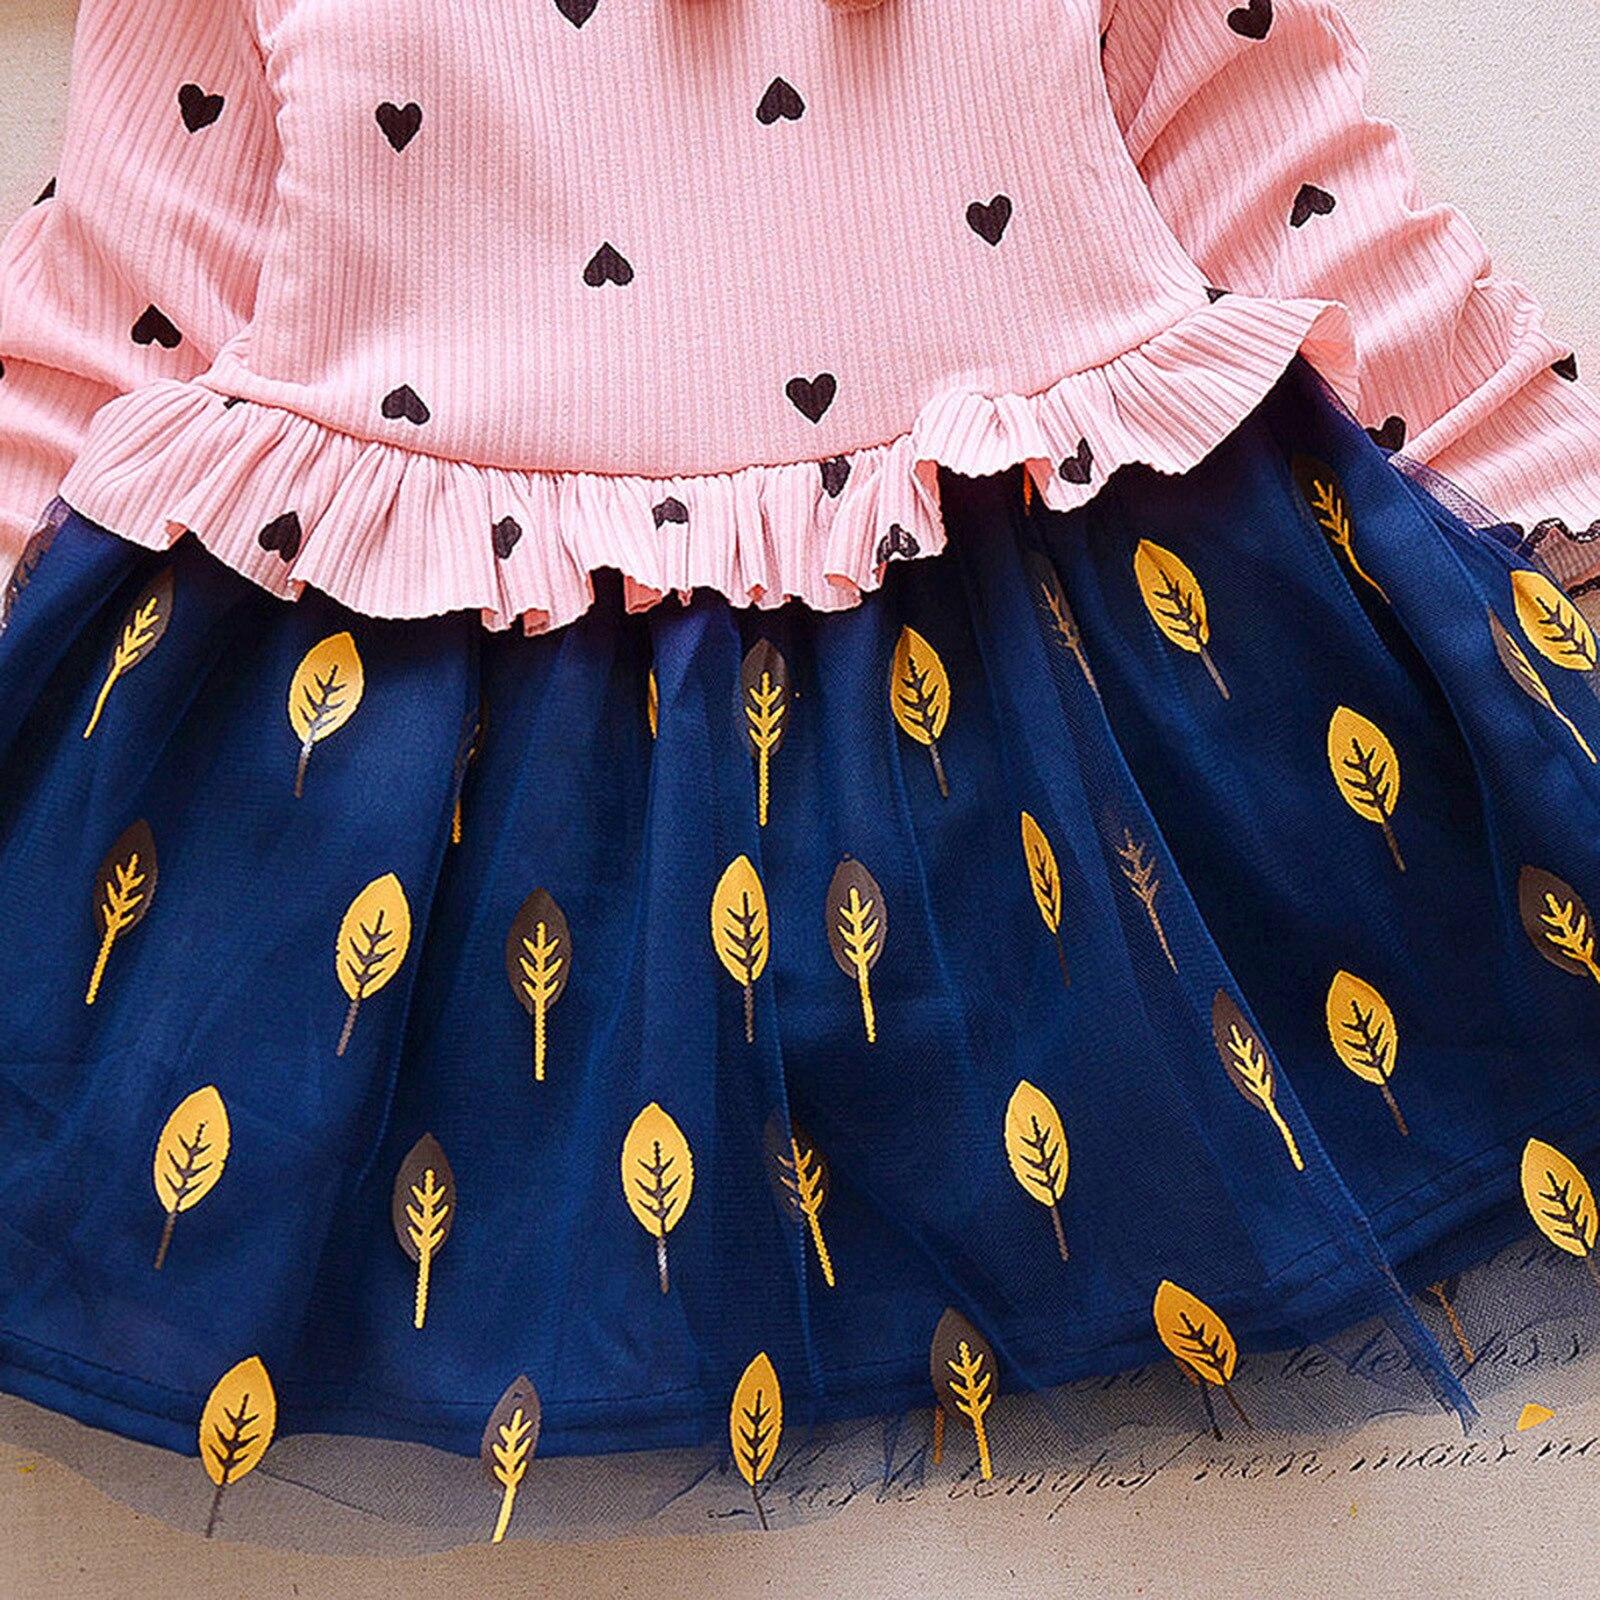 40# Toddler Kids Dresses Baby Girls' Long-sleeved Leaf Net Yarn Stitching Dress Love Dress Kids Clothes Girls תחפושות לתינוקות 4